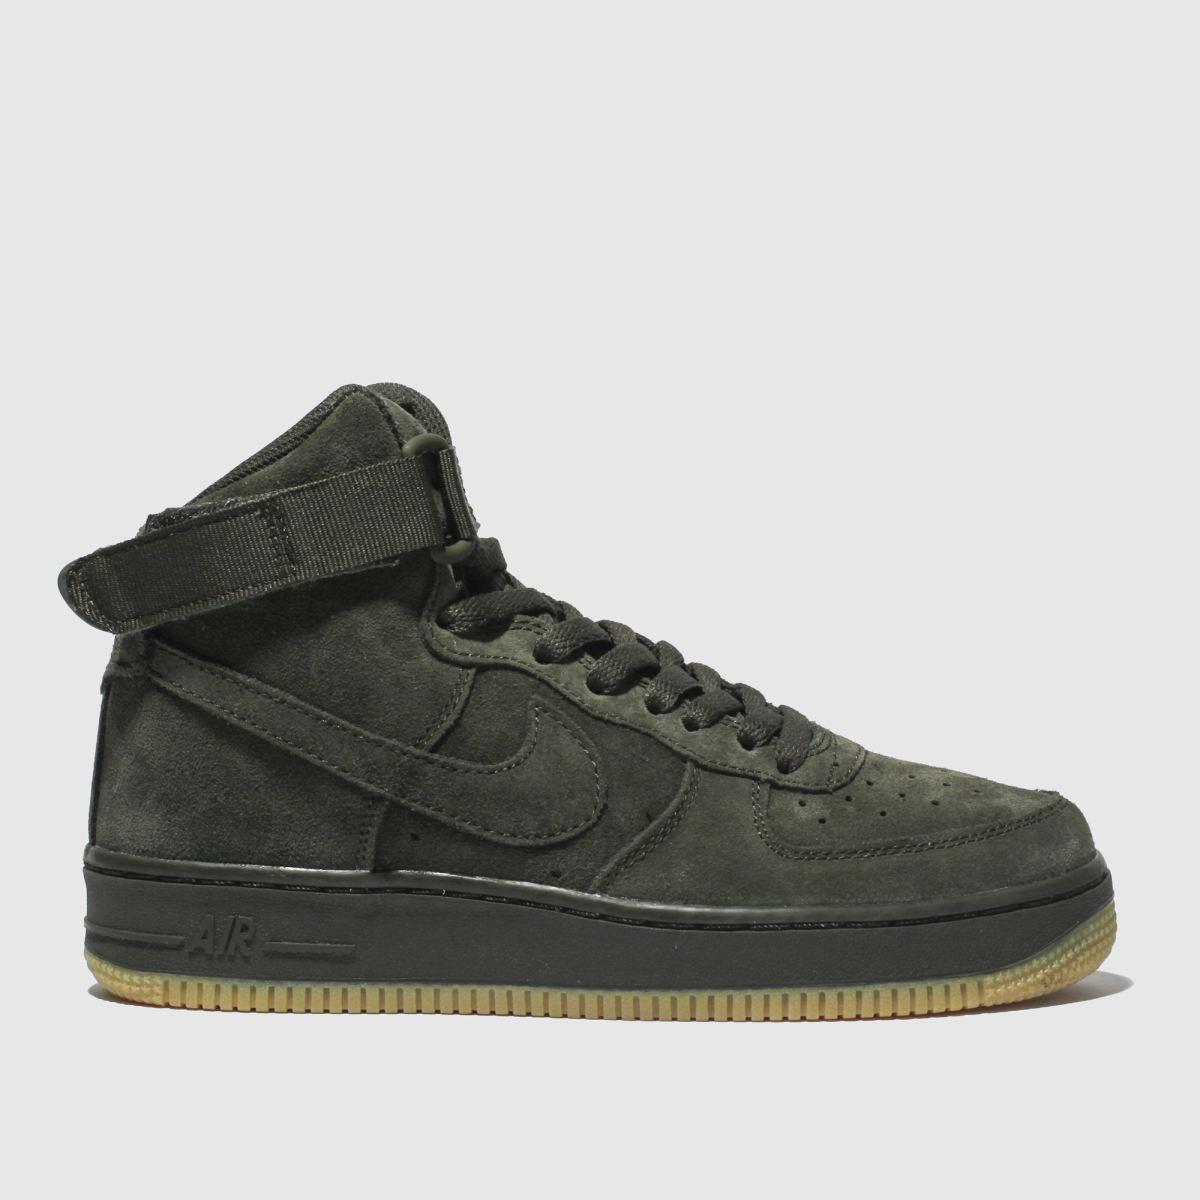 Nike Khaki Air Force 1 High Lv8 Trainers Youth